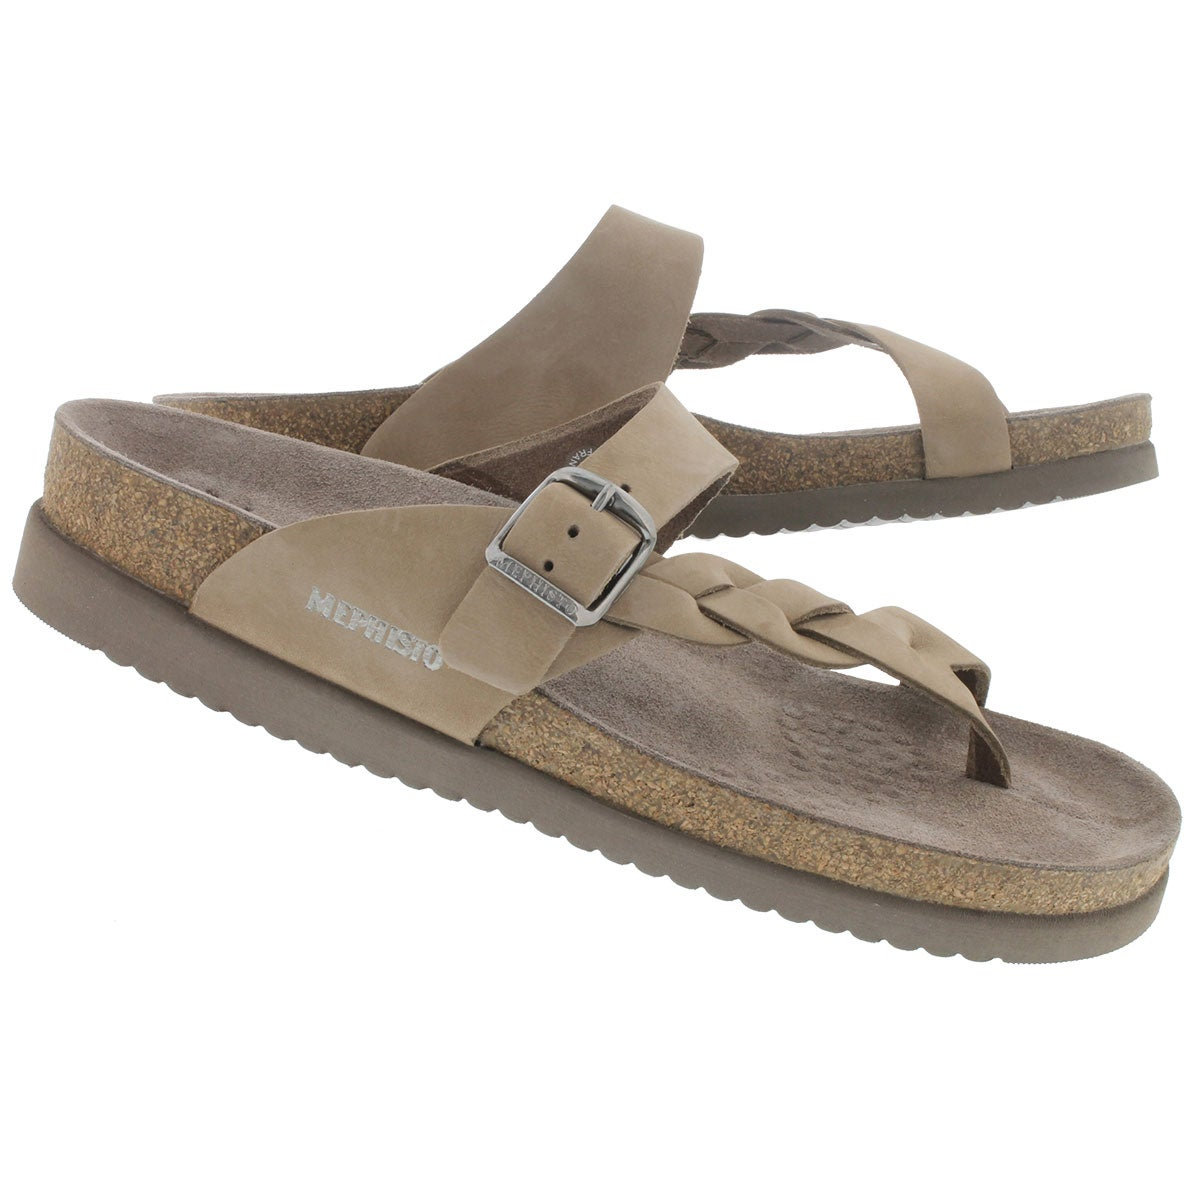 Lds Helen Twist lt bge crk footbed thong